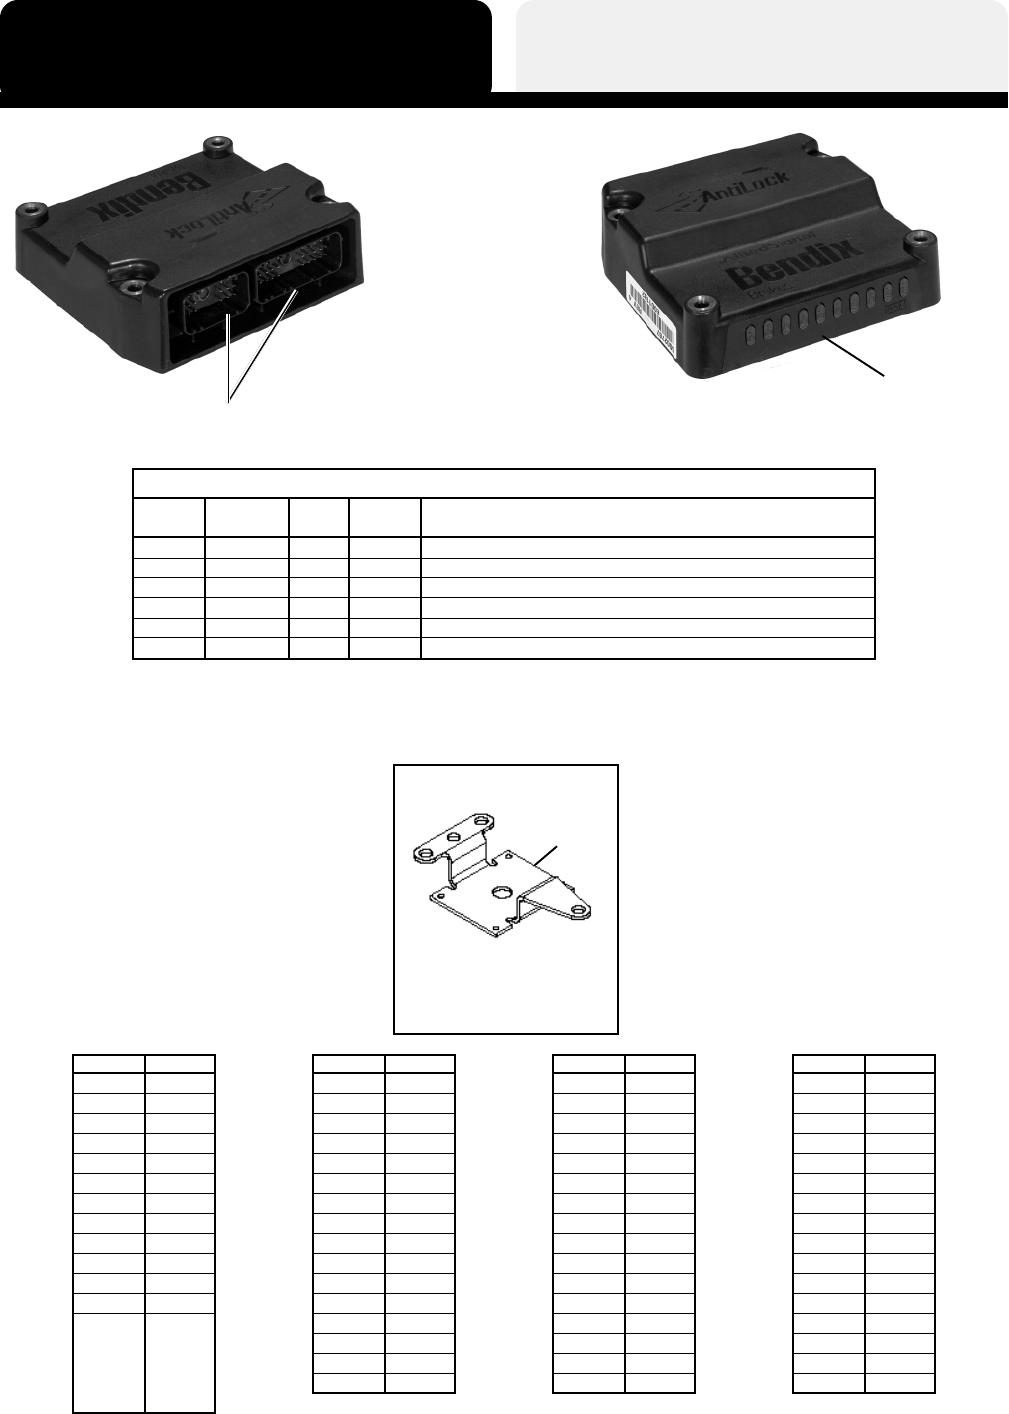 2001 jimmy 4x4 user manual